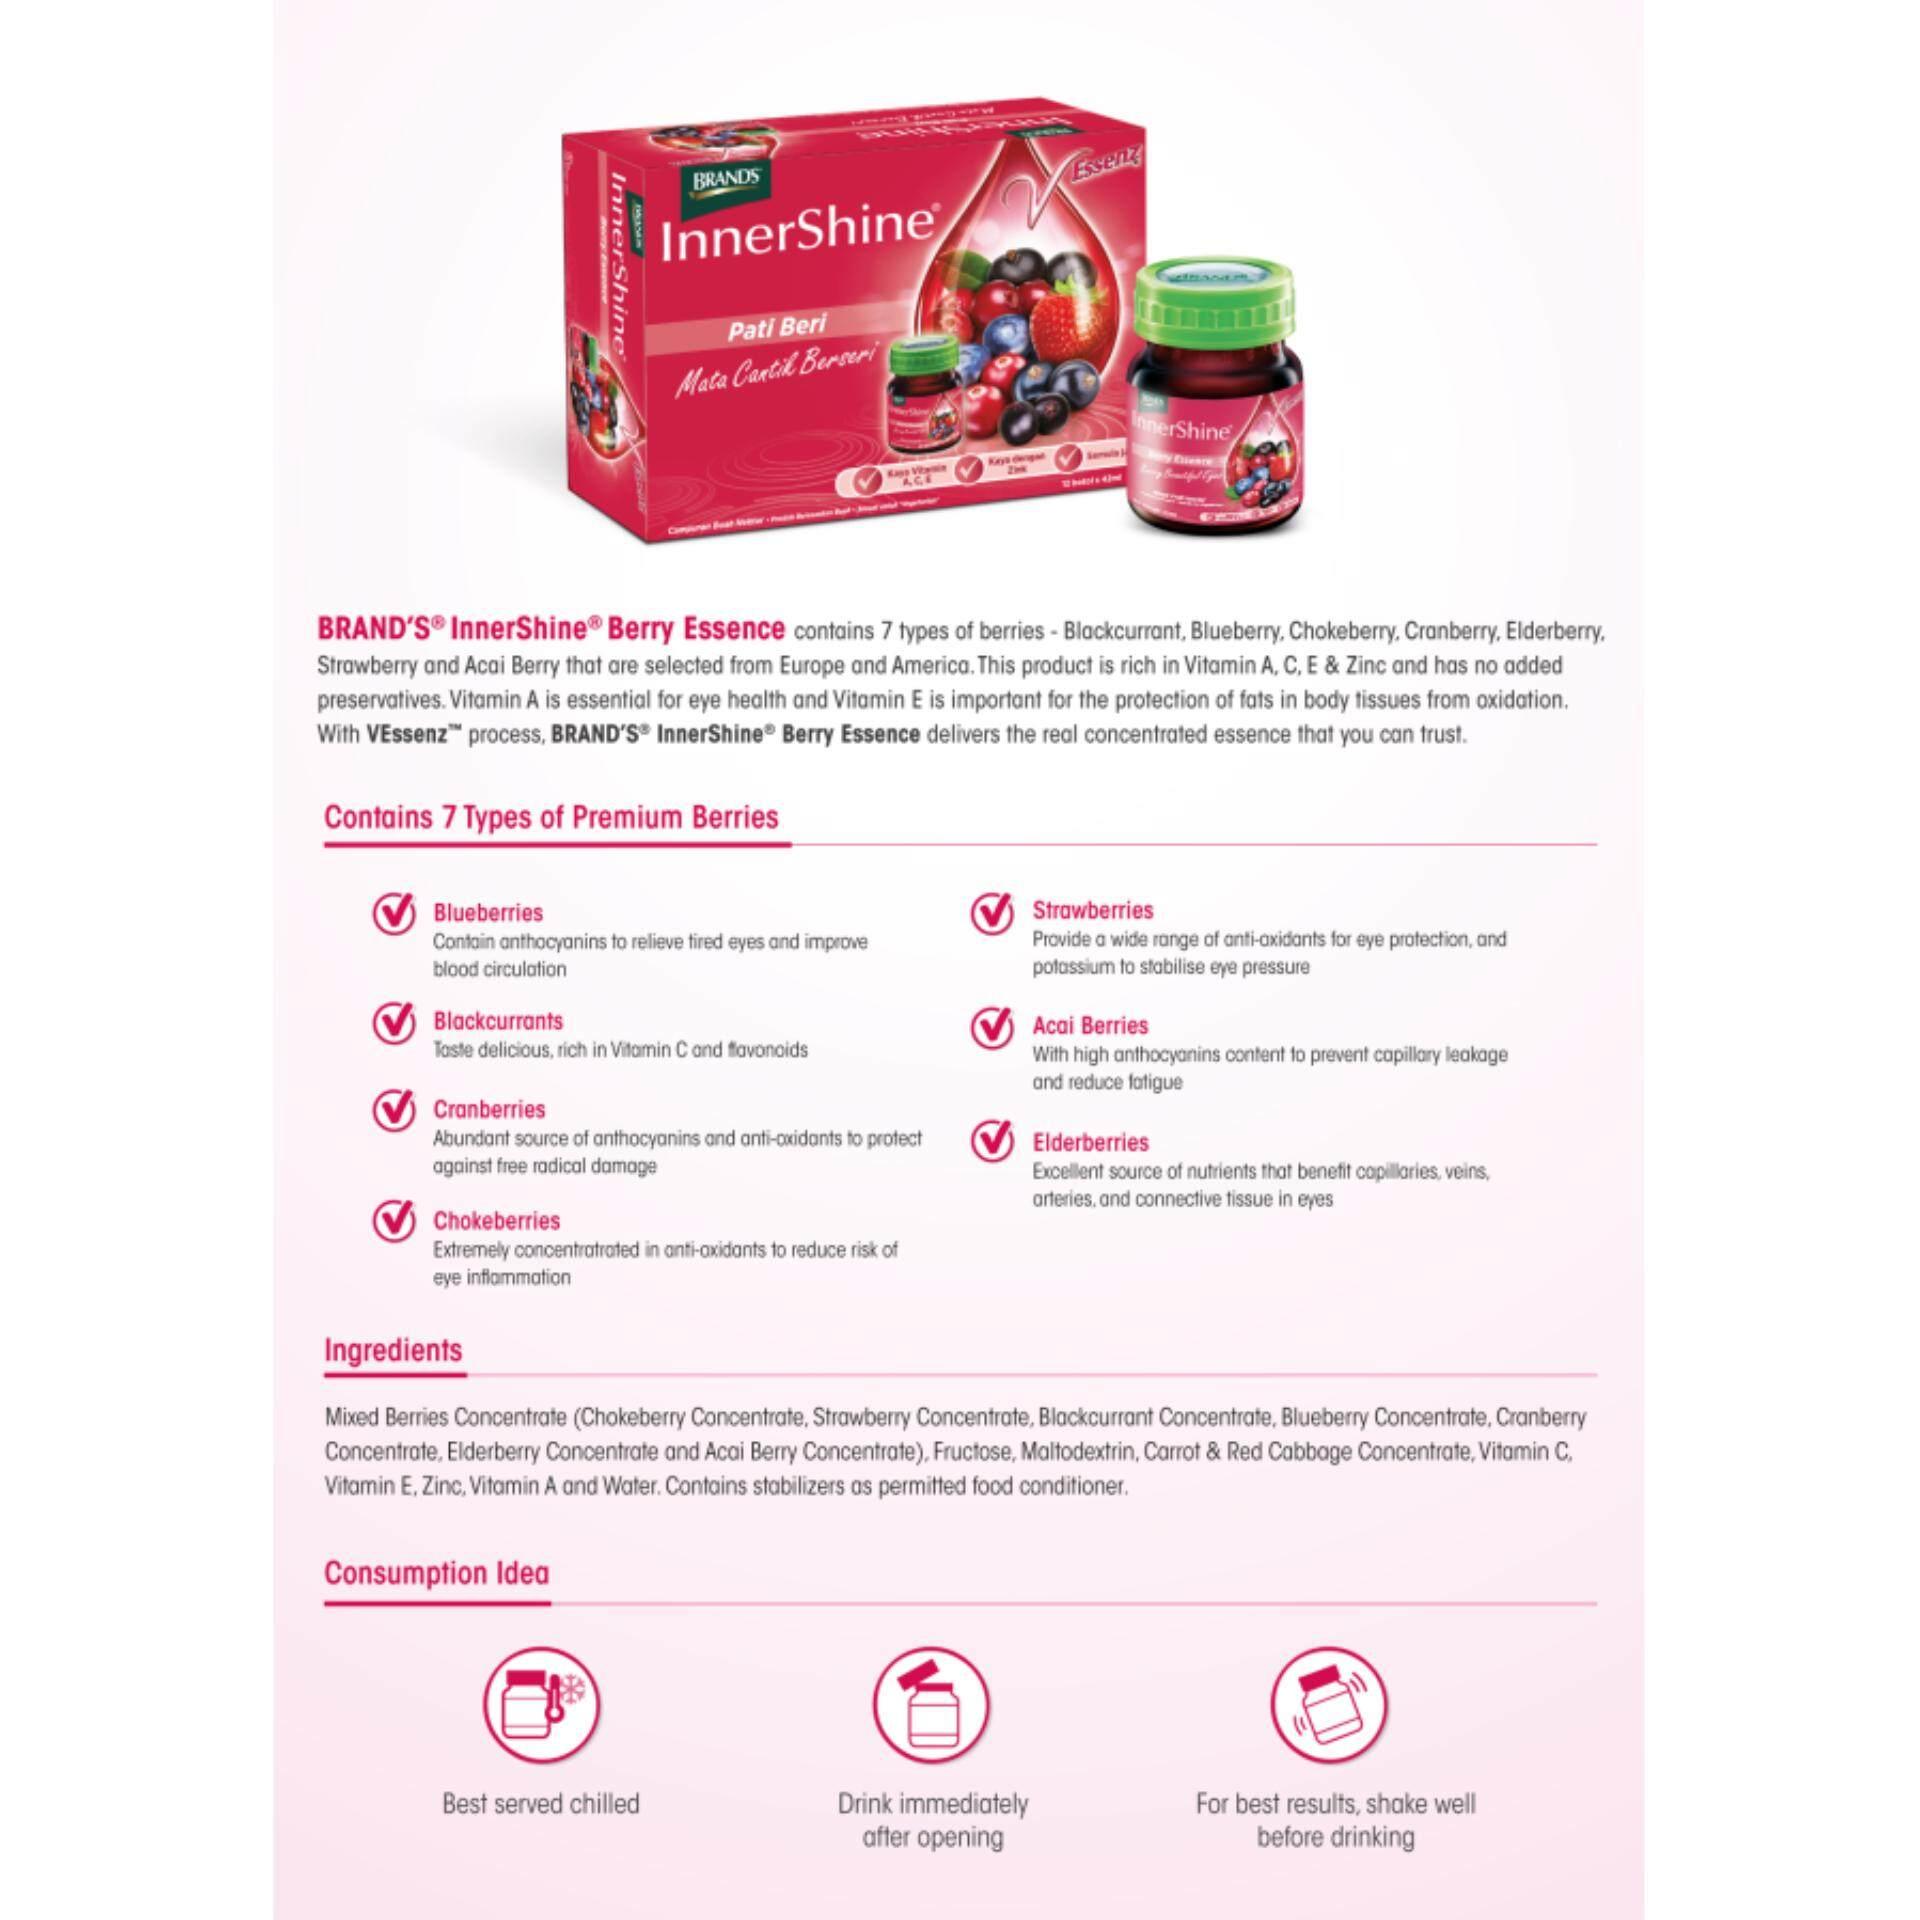 BRAND'S InnerShine Berry Essence Single Pack (6's) - 6 bottles x 42ml